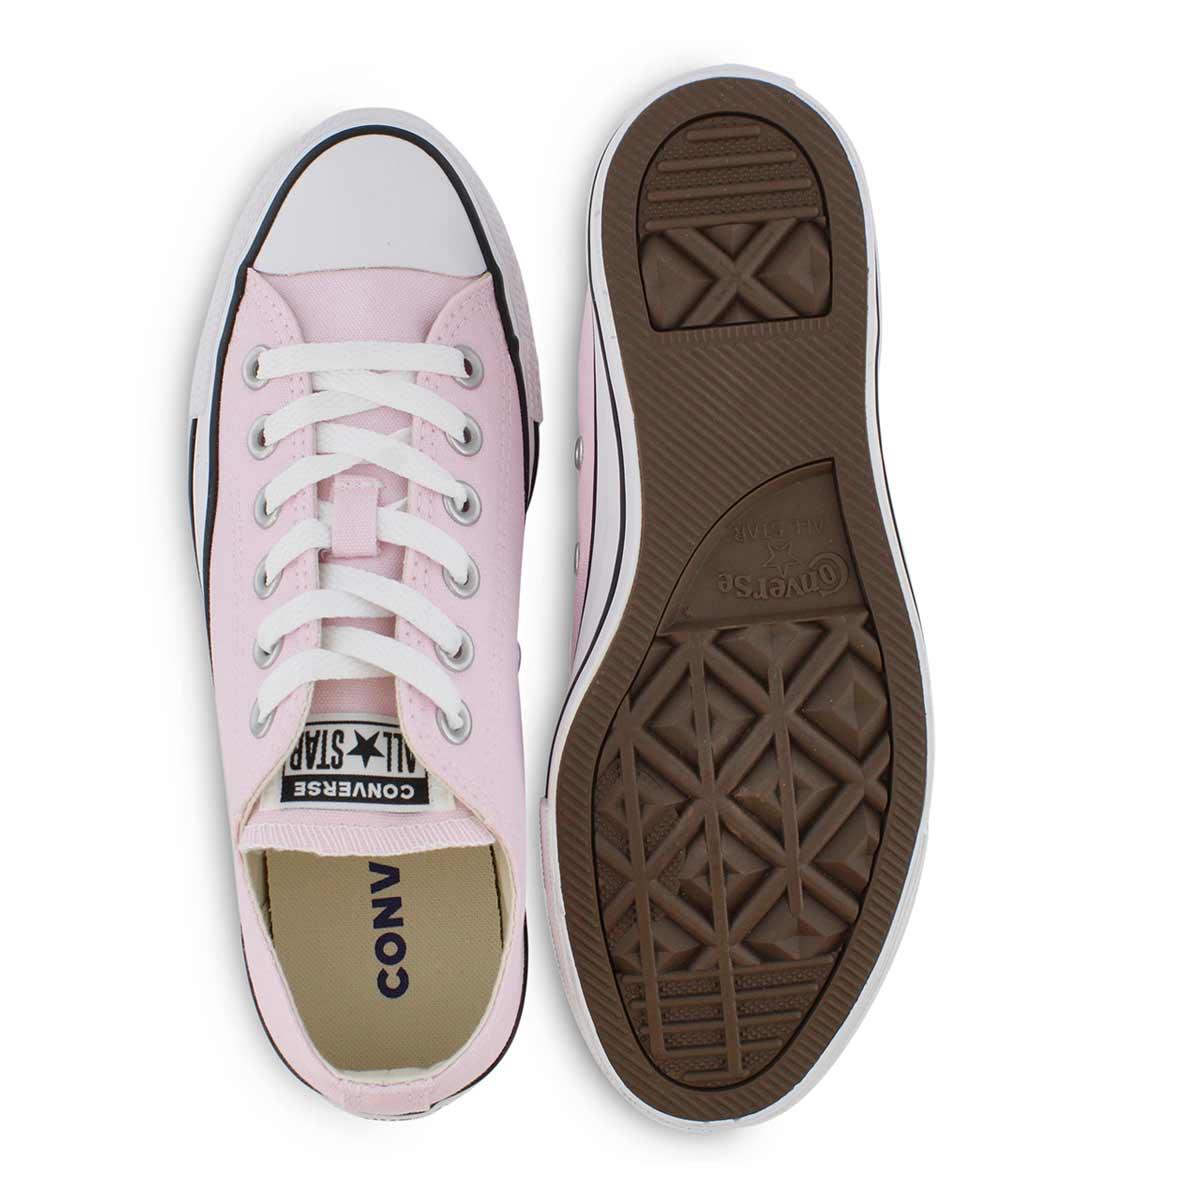 Women's CT ALL STAR SEASONAL OX pink sneakers